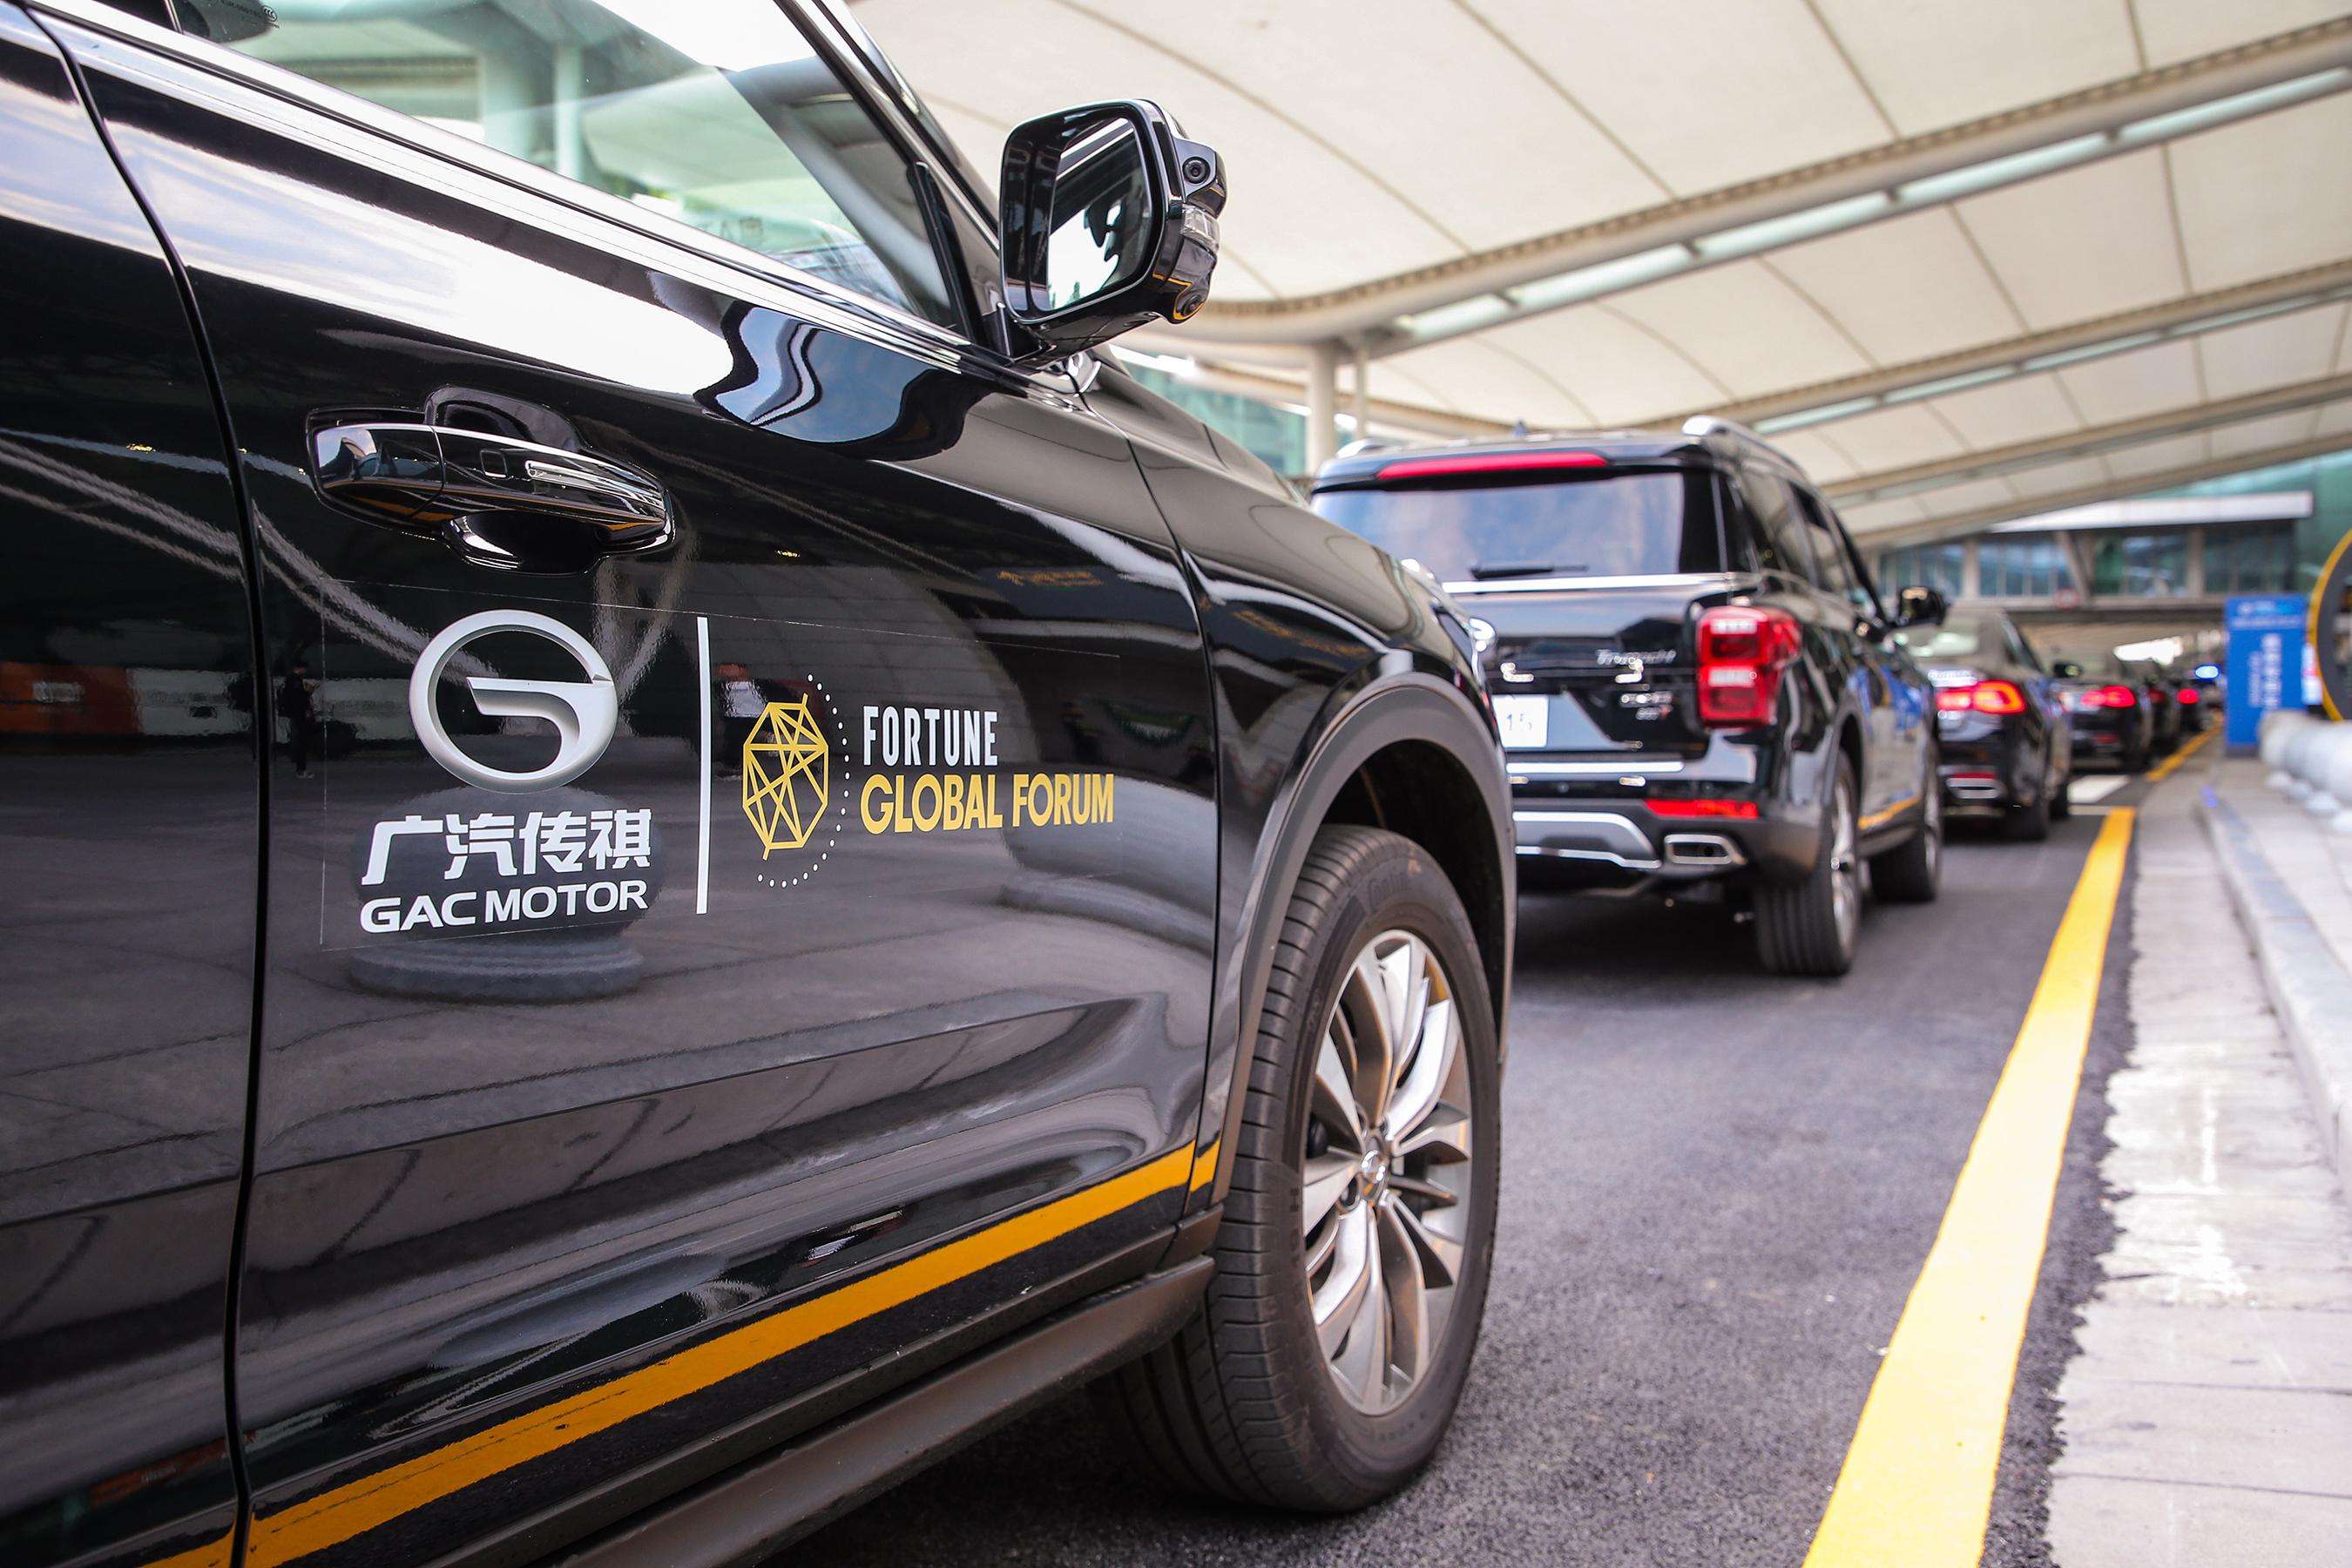 GAC Motor provides 380 cars including GA8 sedan, GS8 SUV and GM8 MPV